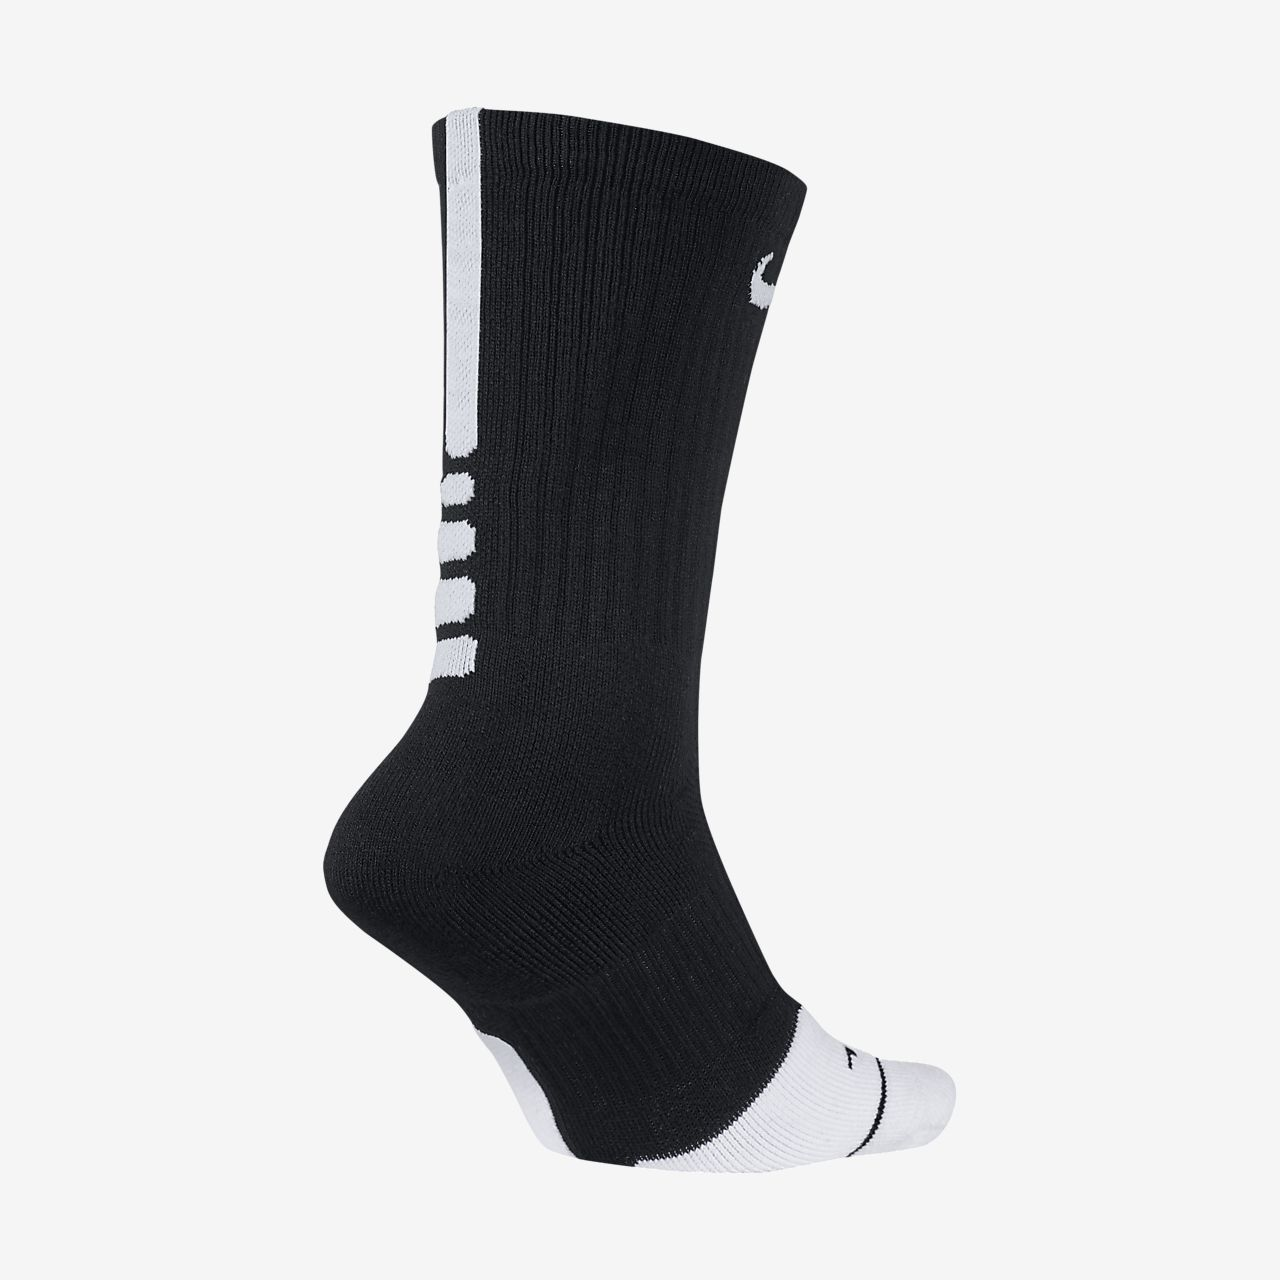 Calze da basket Nike Dry Elite 1.5 Crew